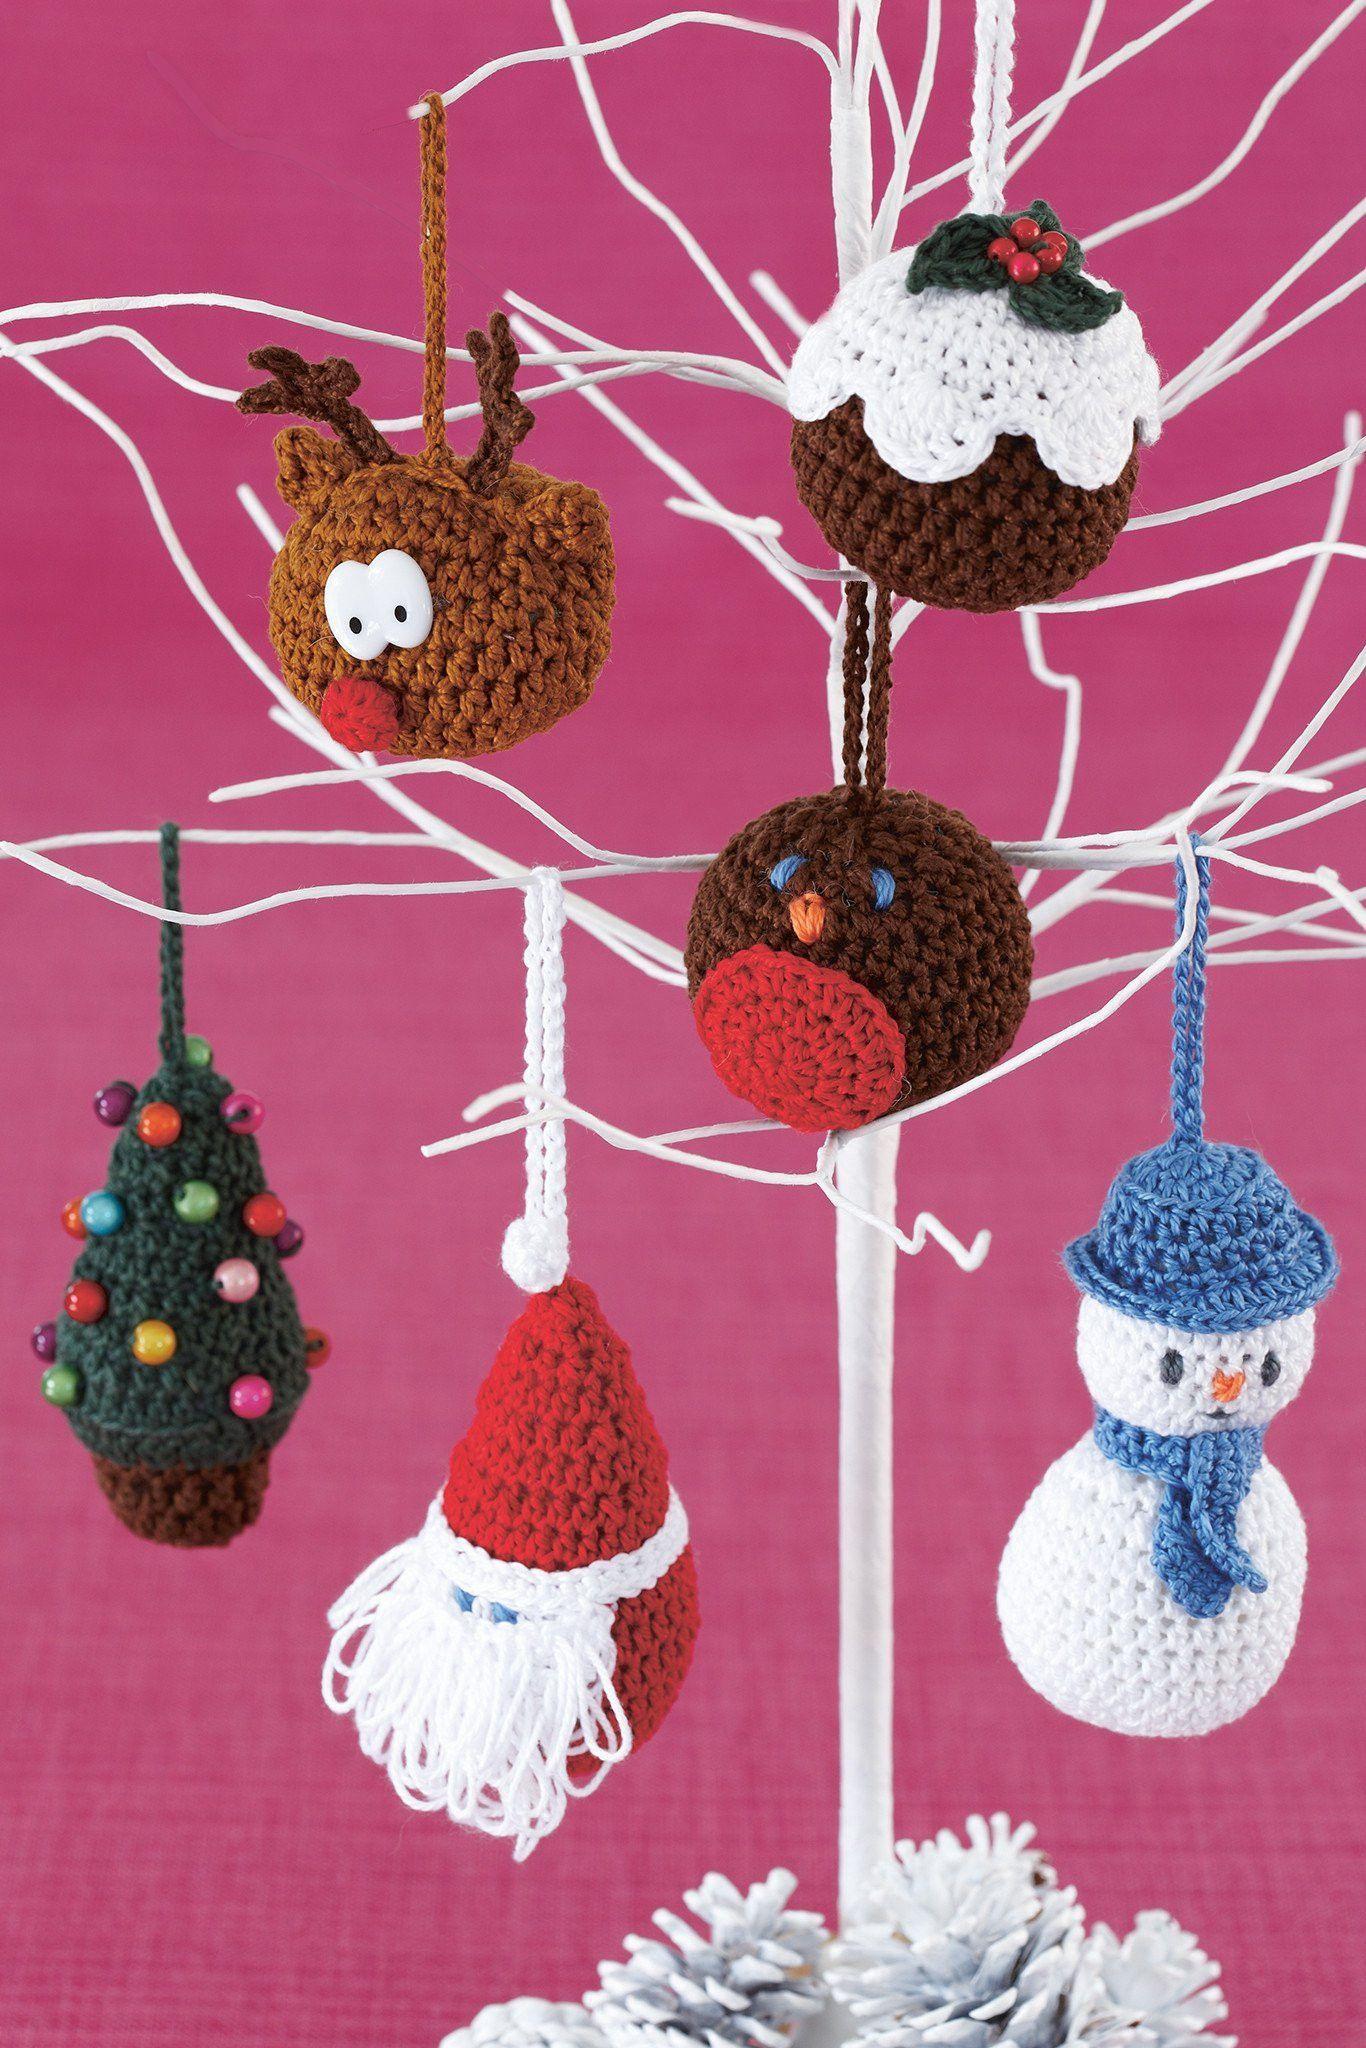 Festive Christmas Tree Decorations Crochet Patterns